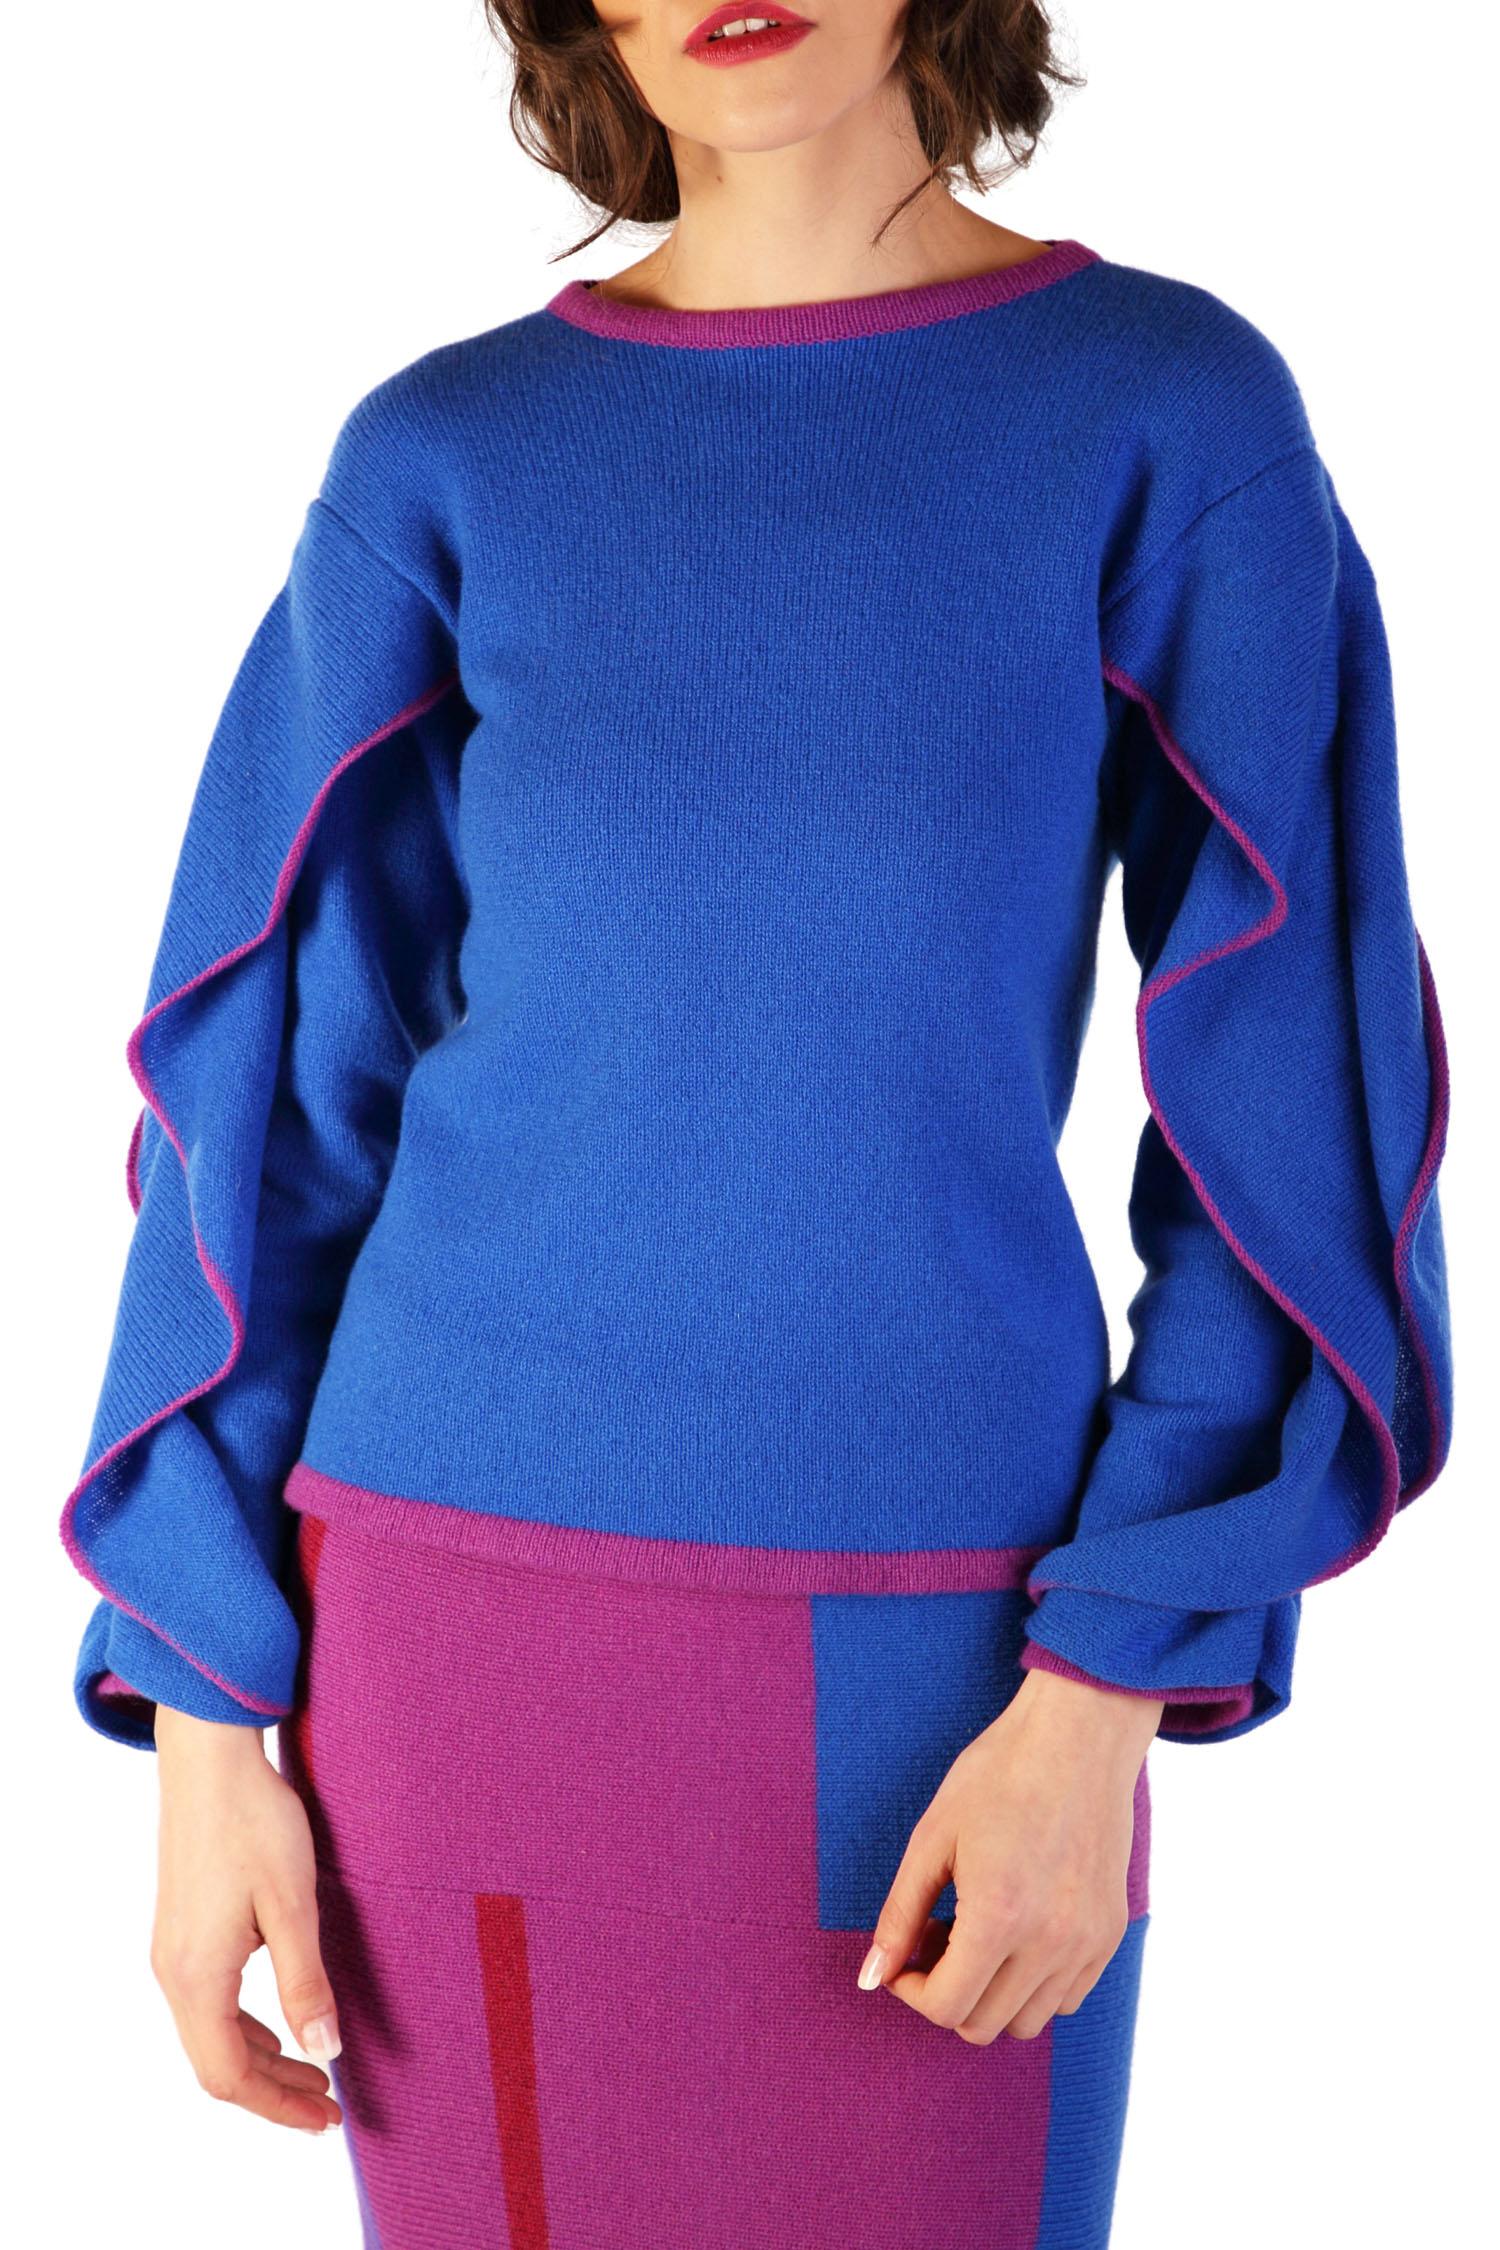 Ruffle sleeve jumper